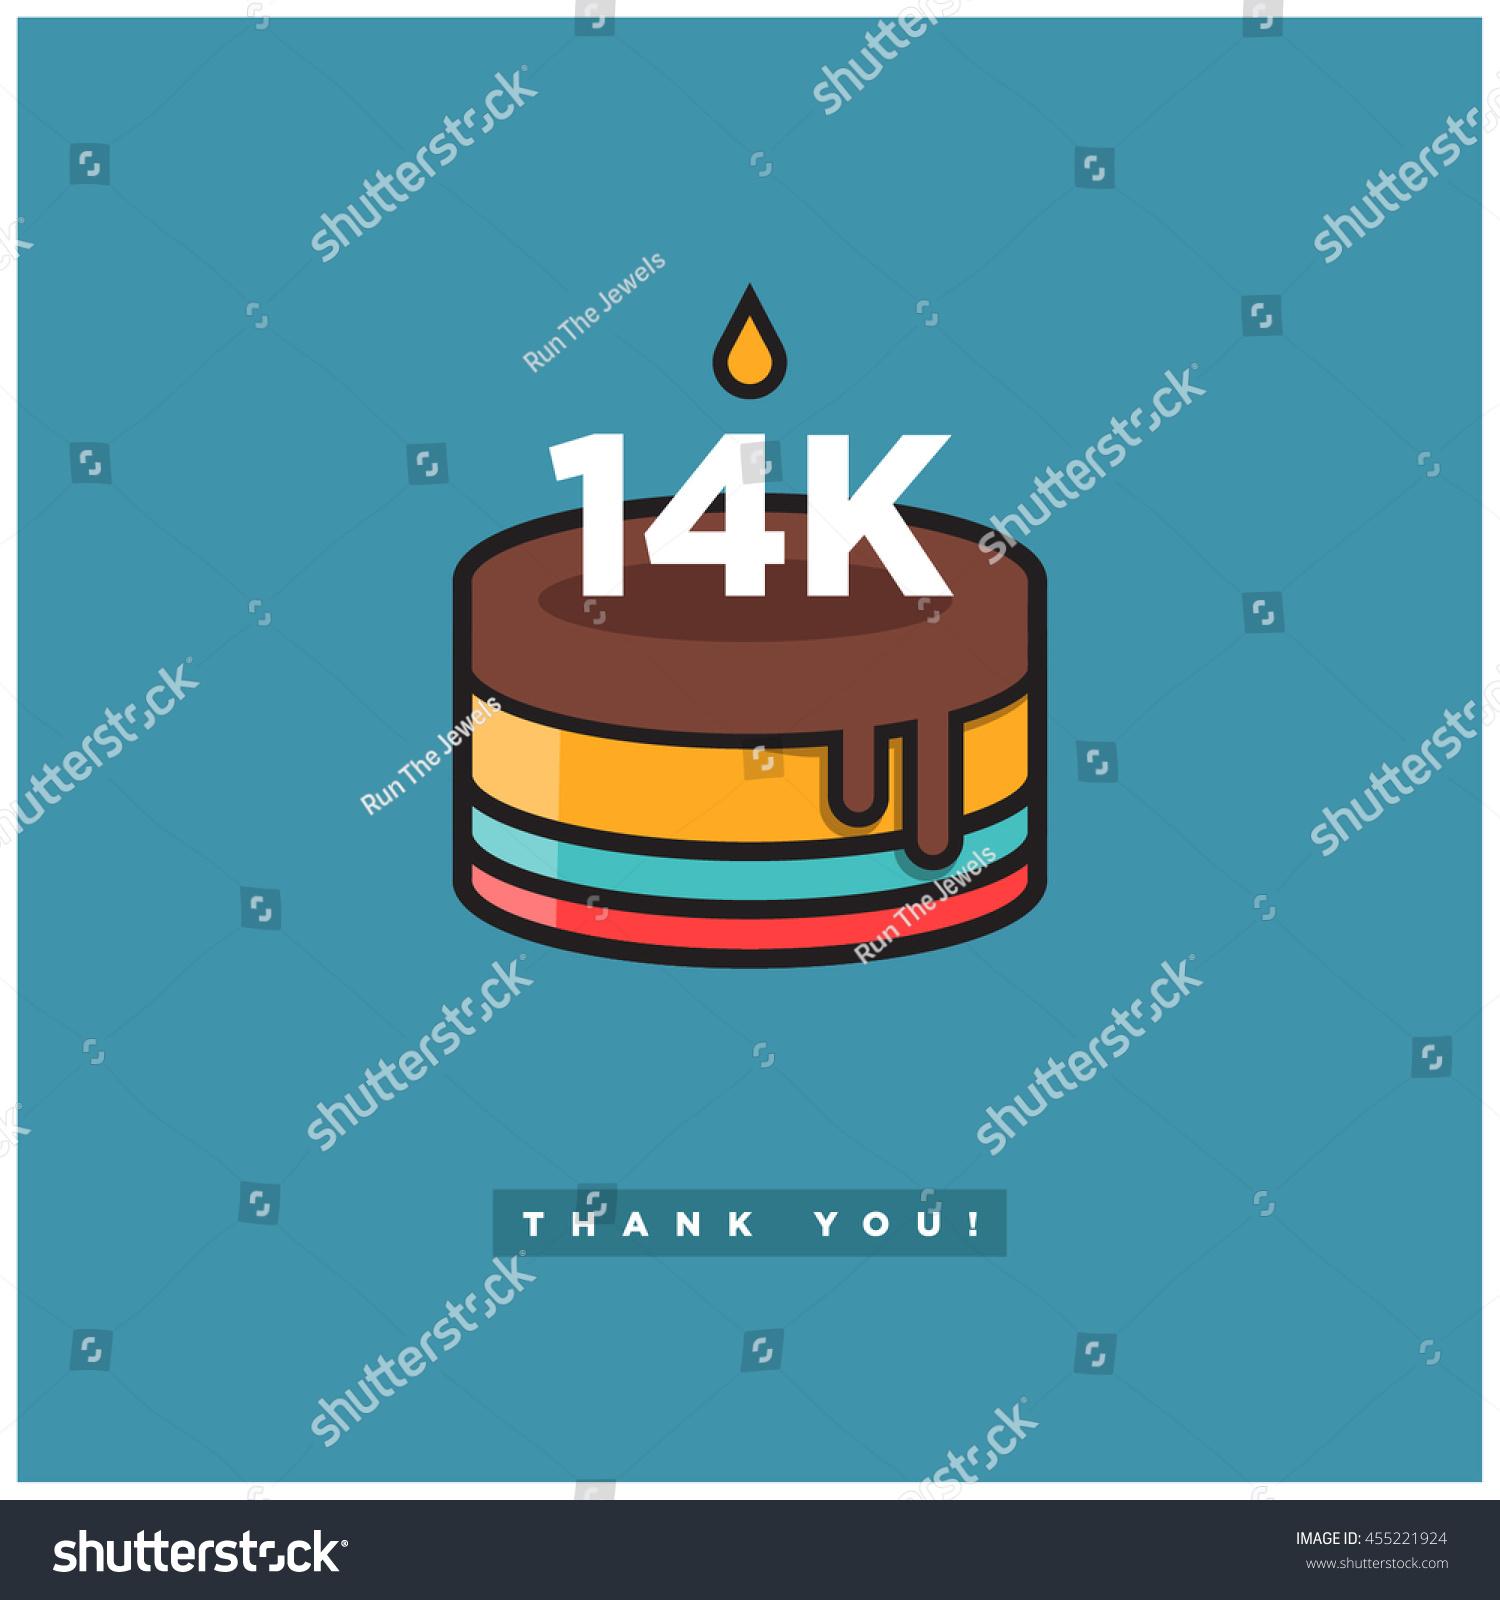 birthday cake 14 k likes vector design stock vector royalty free